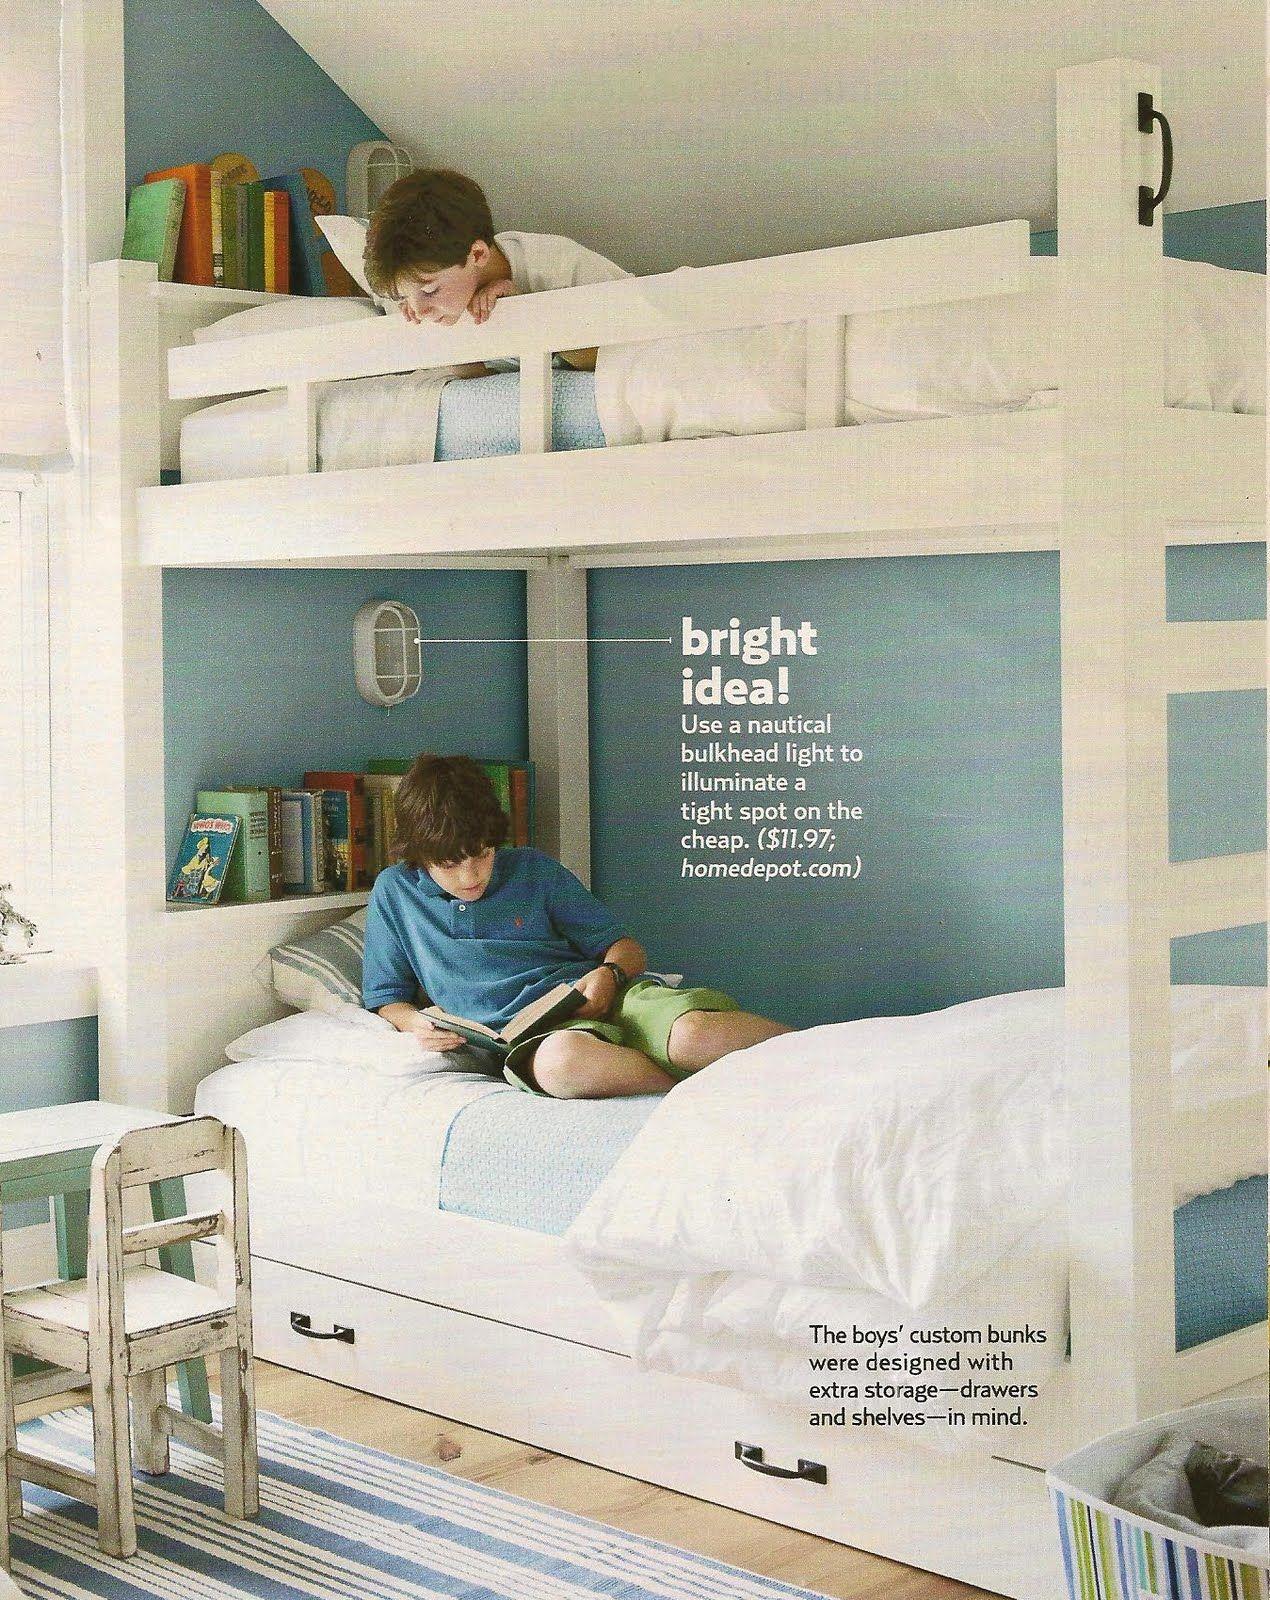 bunk beds  good idea for individual lighting  Baby bunks